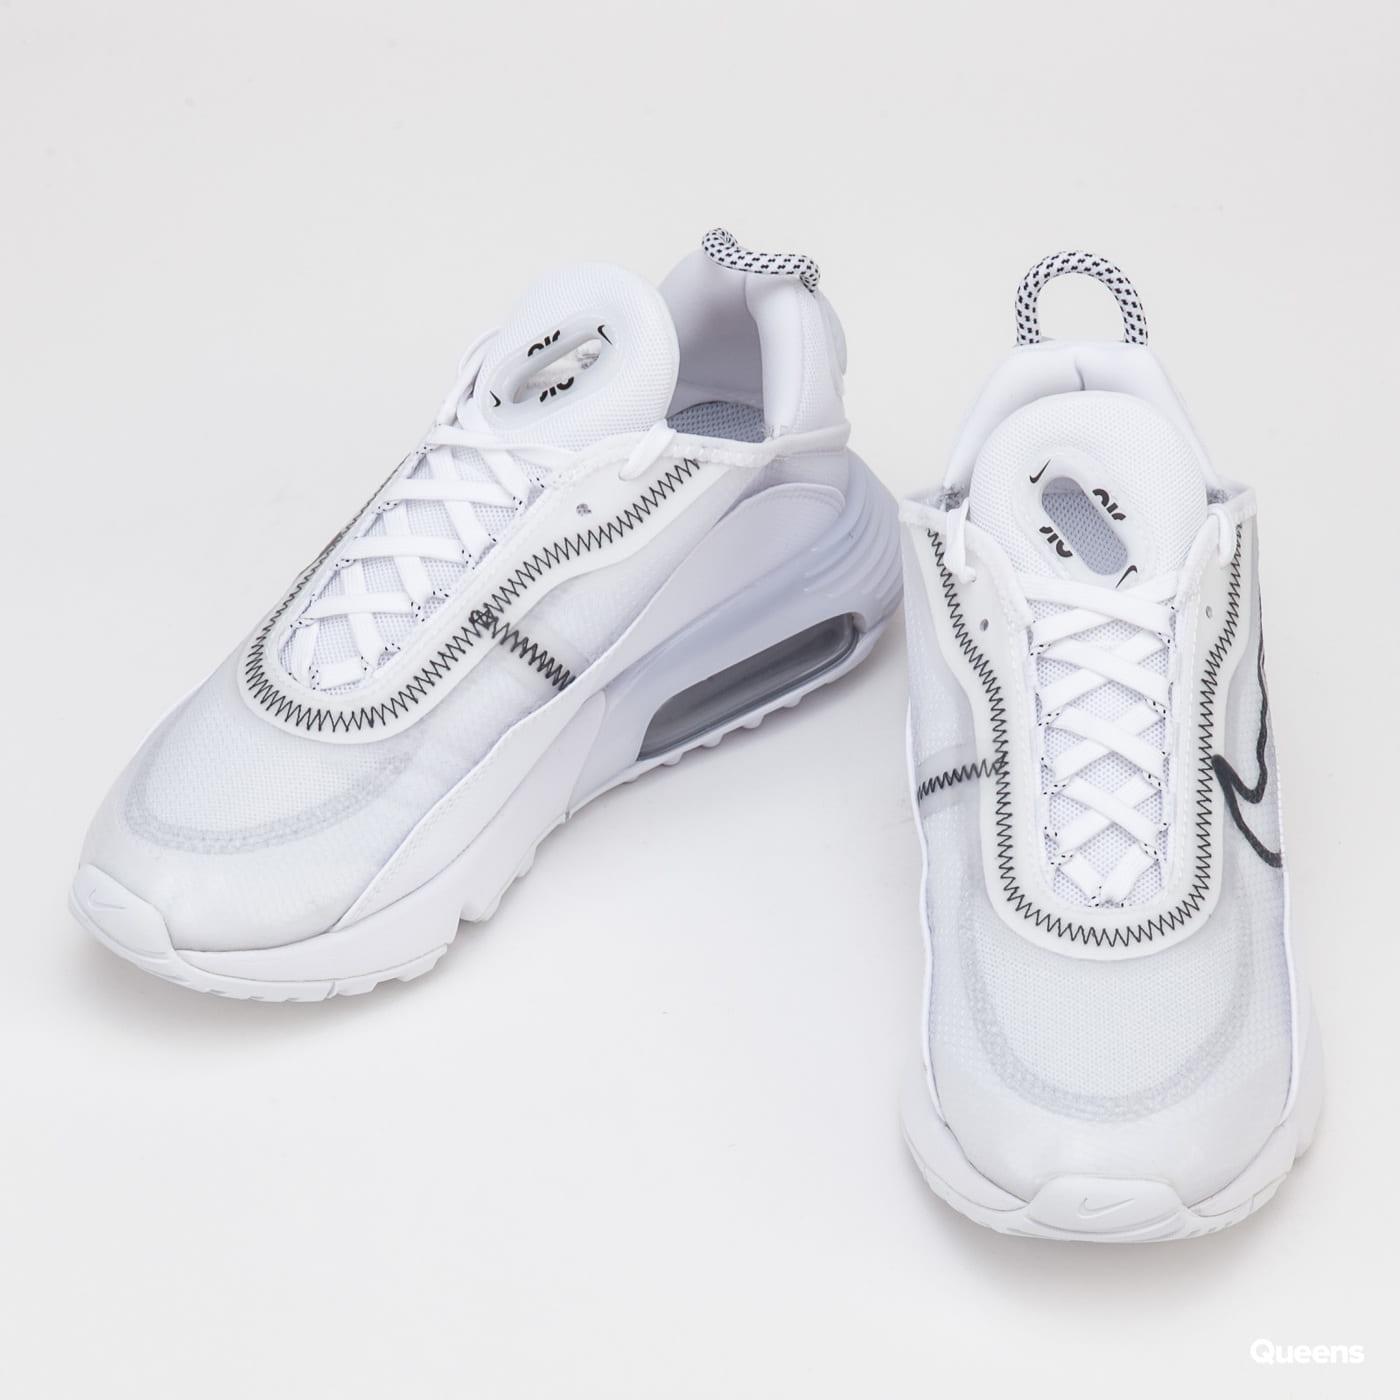 Nike W Air Max 2090 white / black - wolf grey